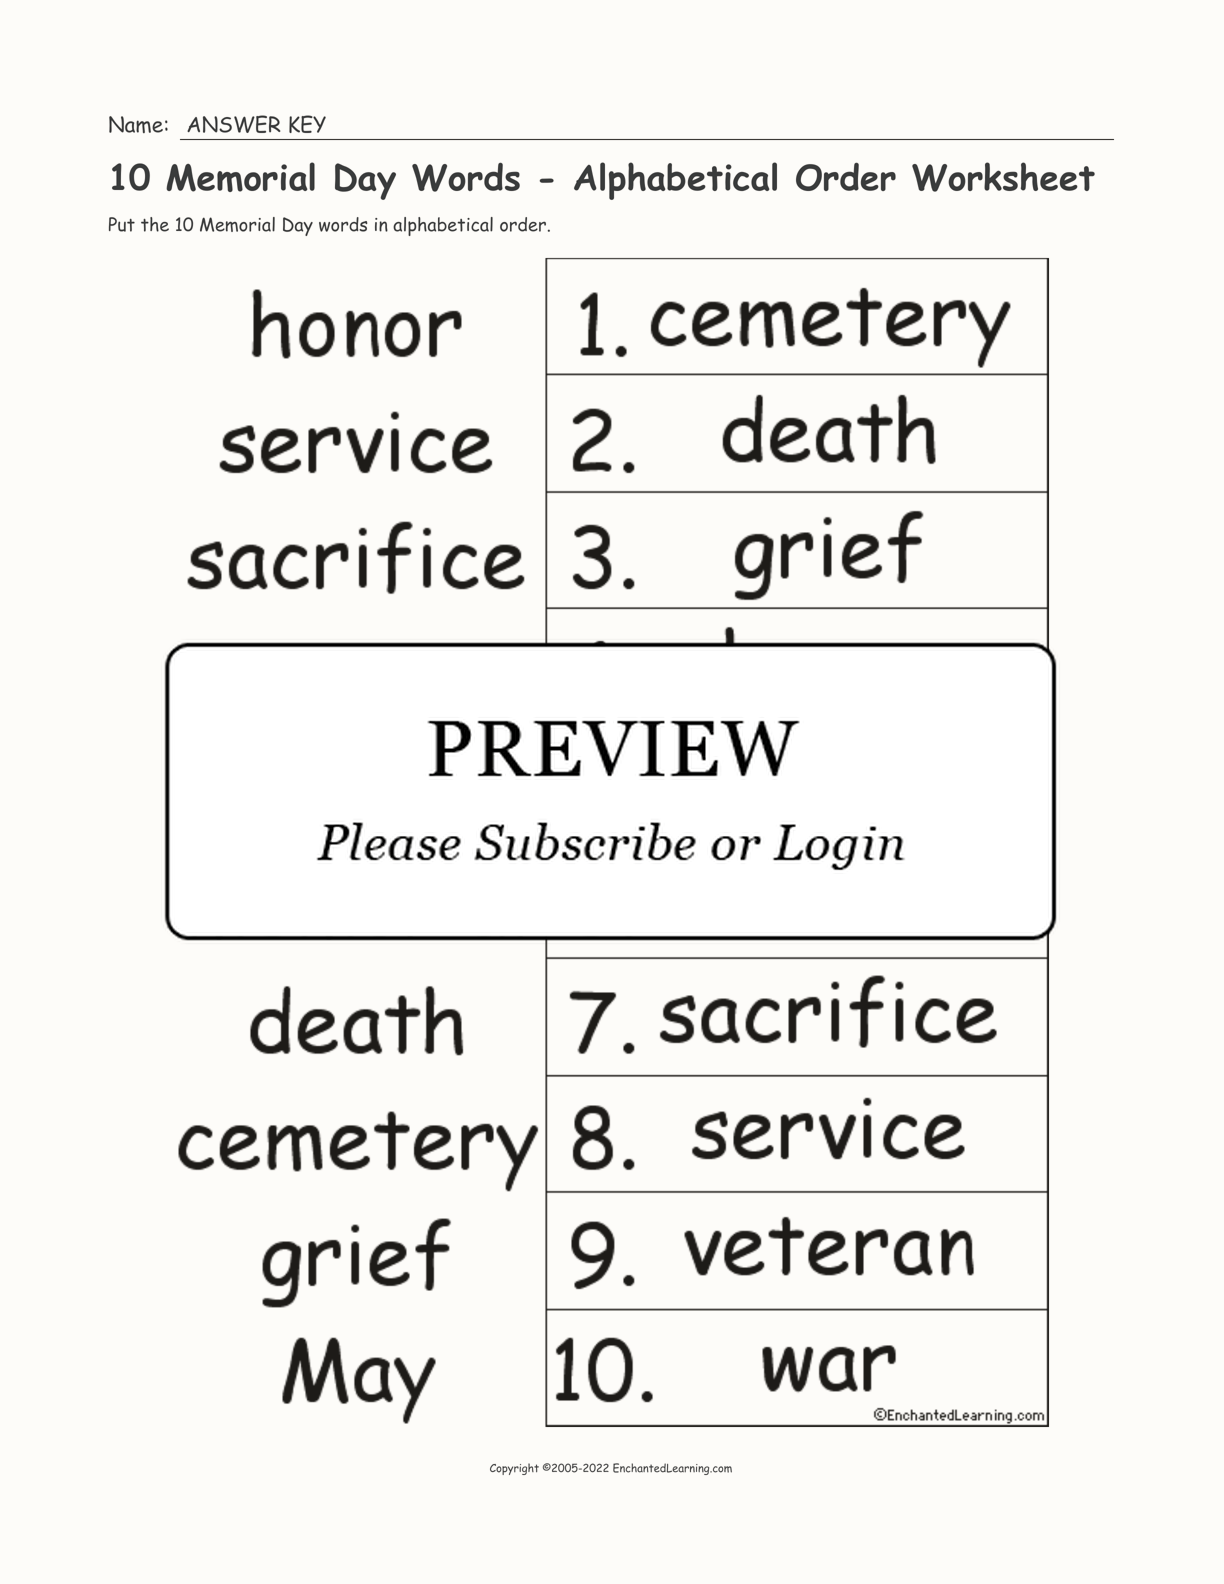 10 Memorial Day Words